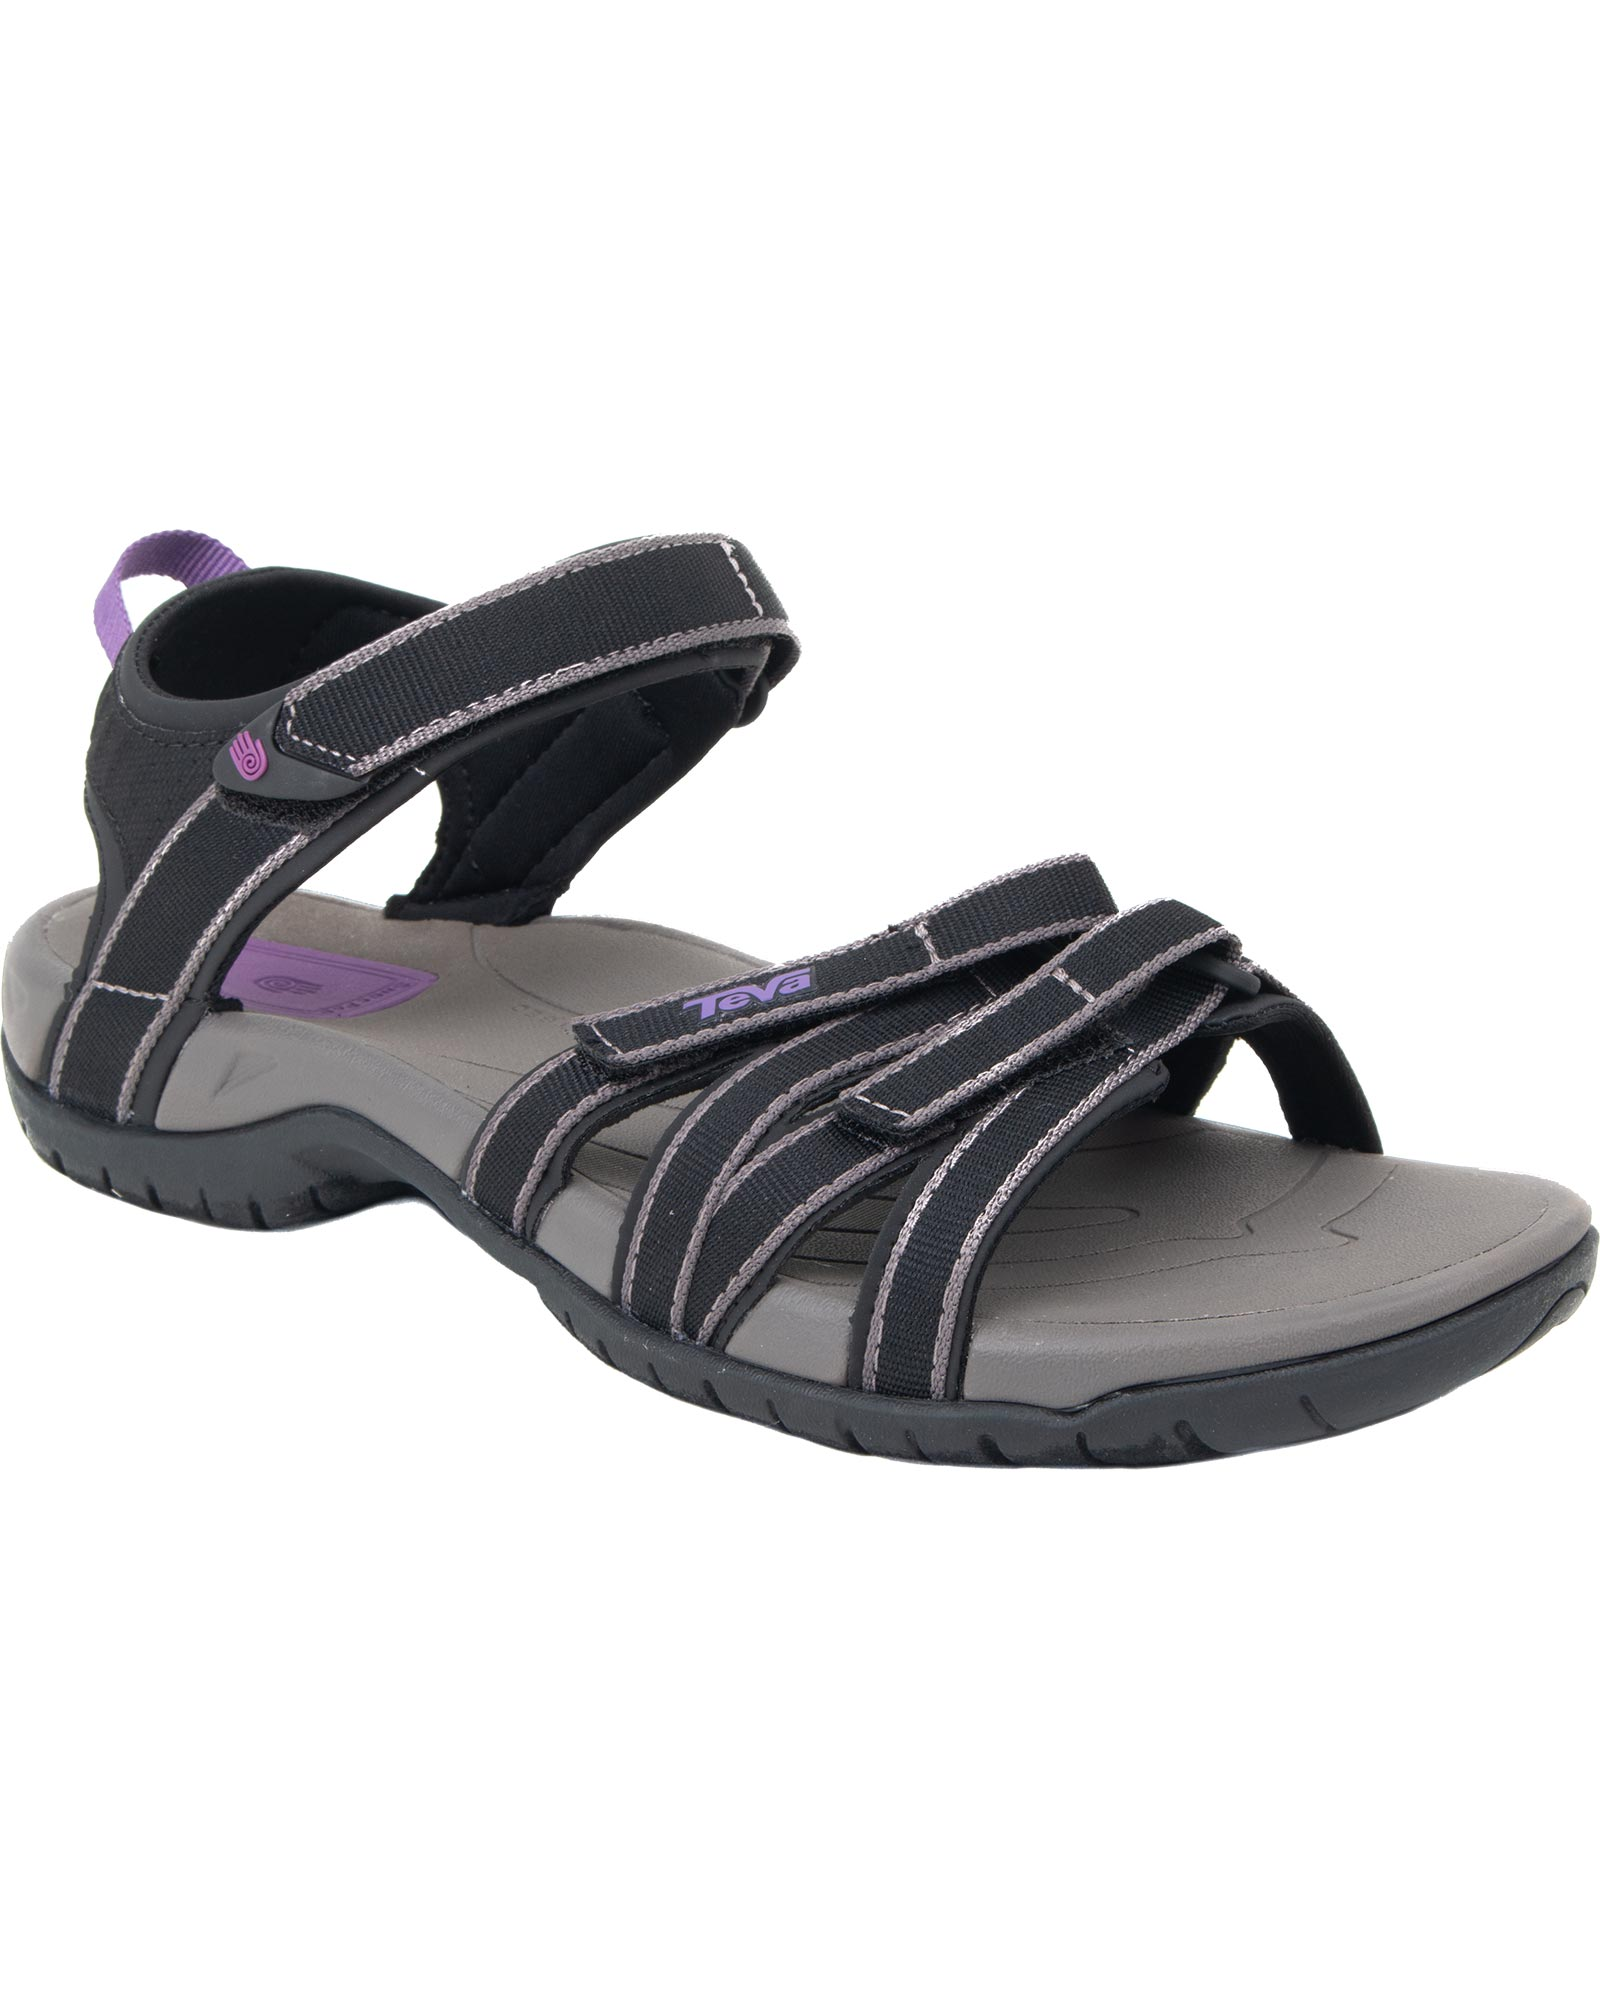 Teva Women's Tirra Sandals 0